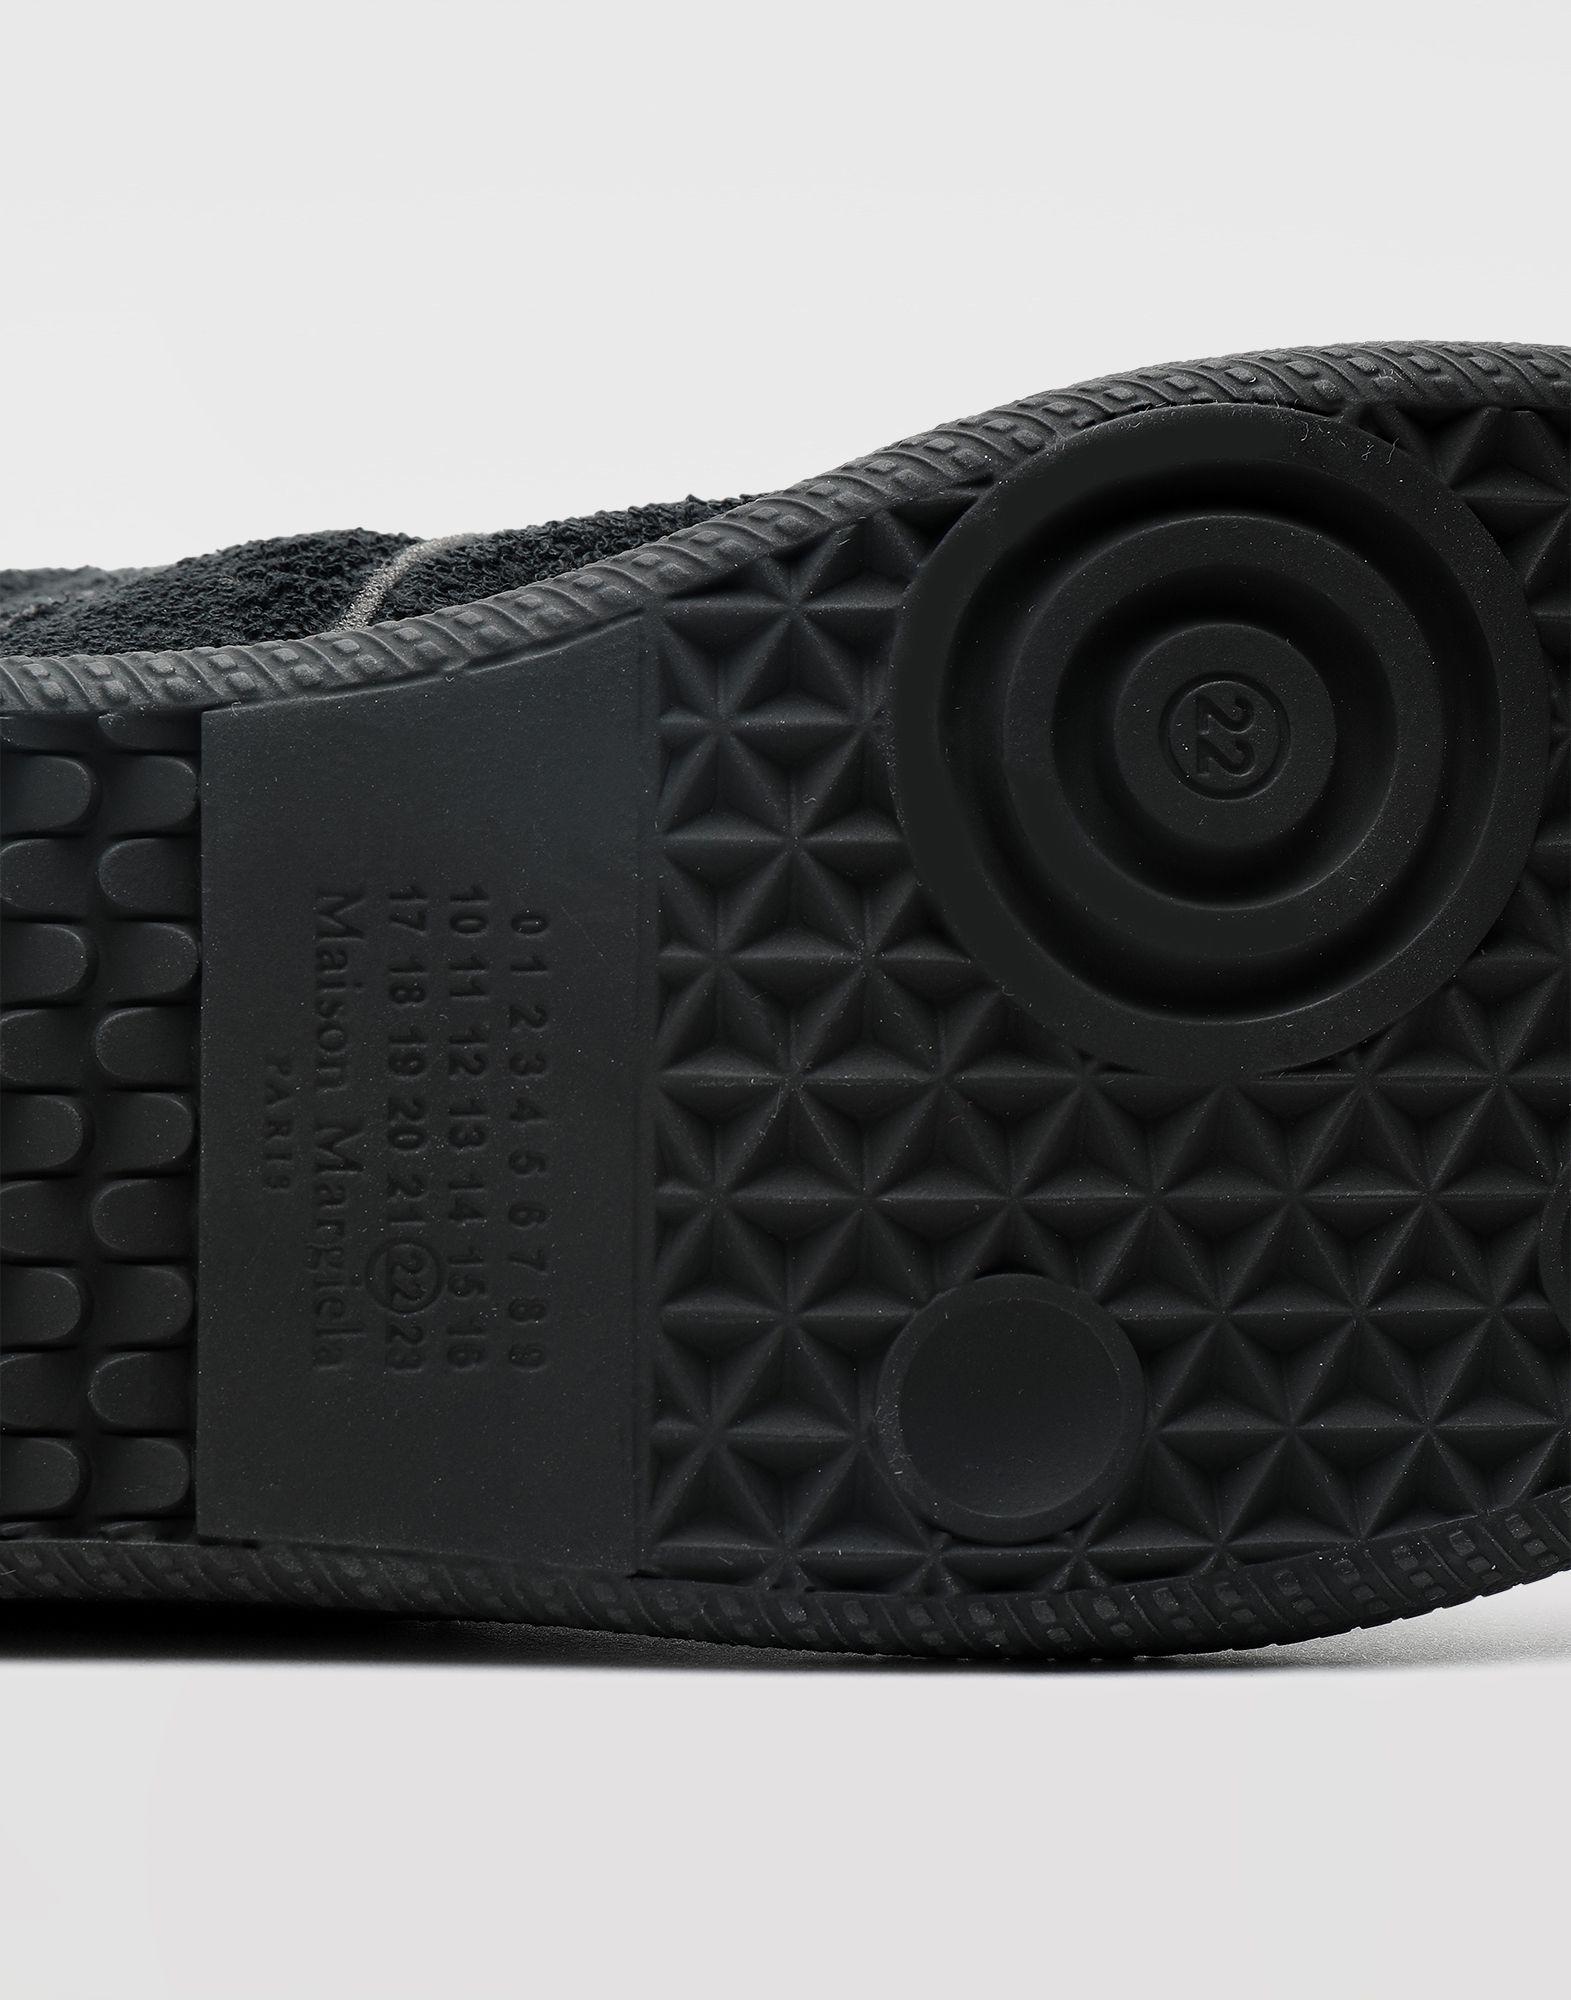 MAISON MARGIELA Sneakers Replica Sneakers Homme b